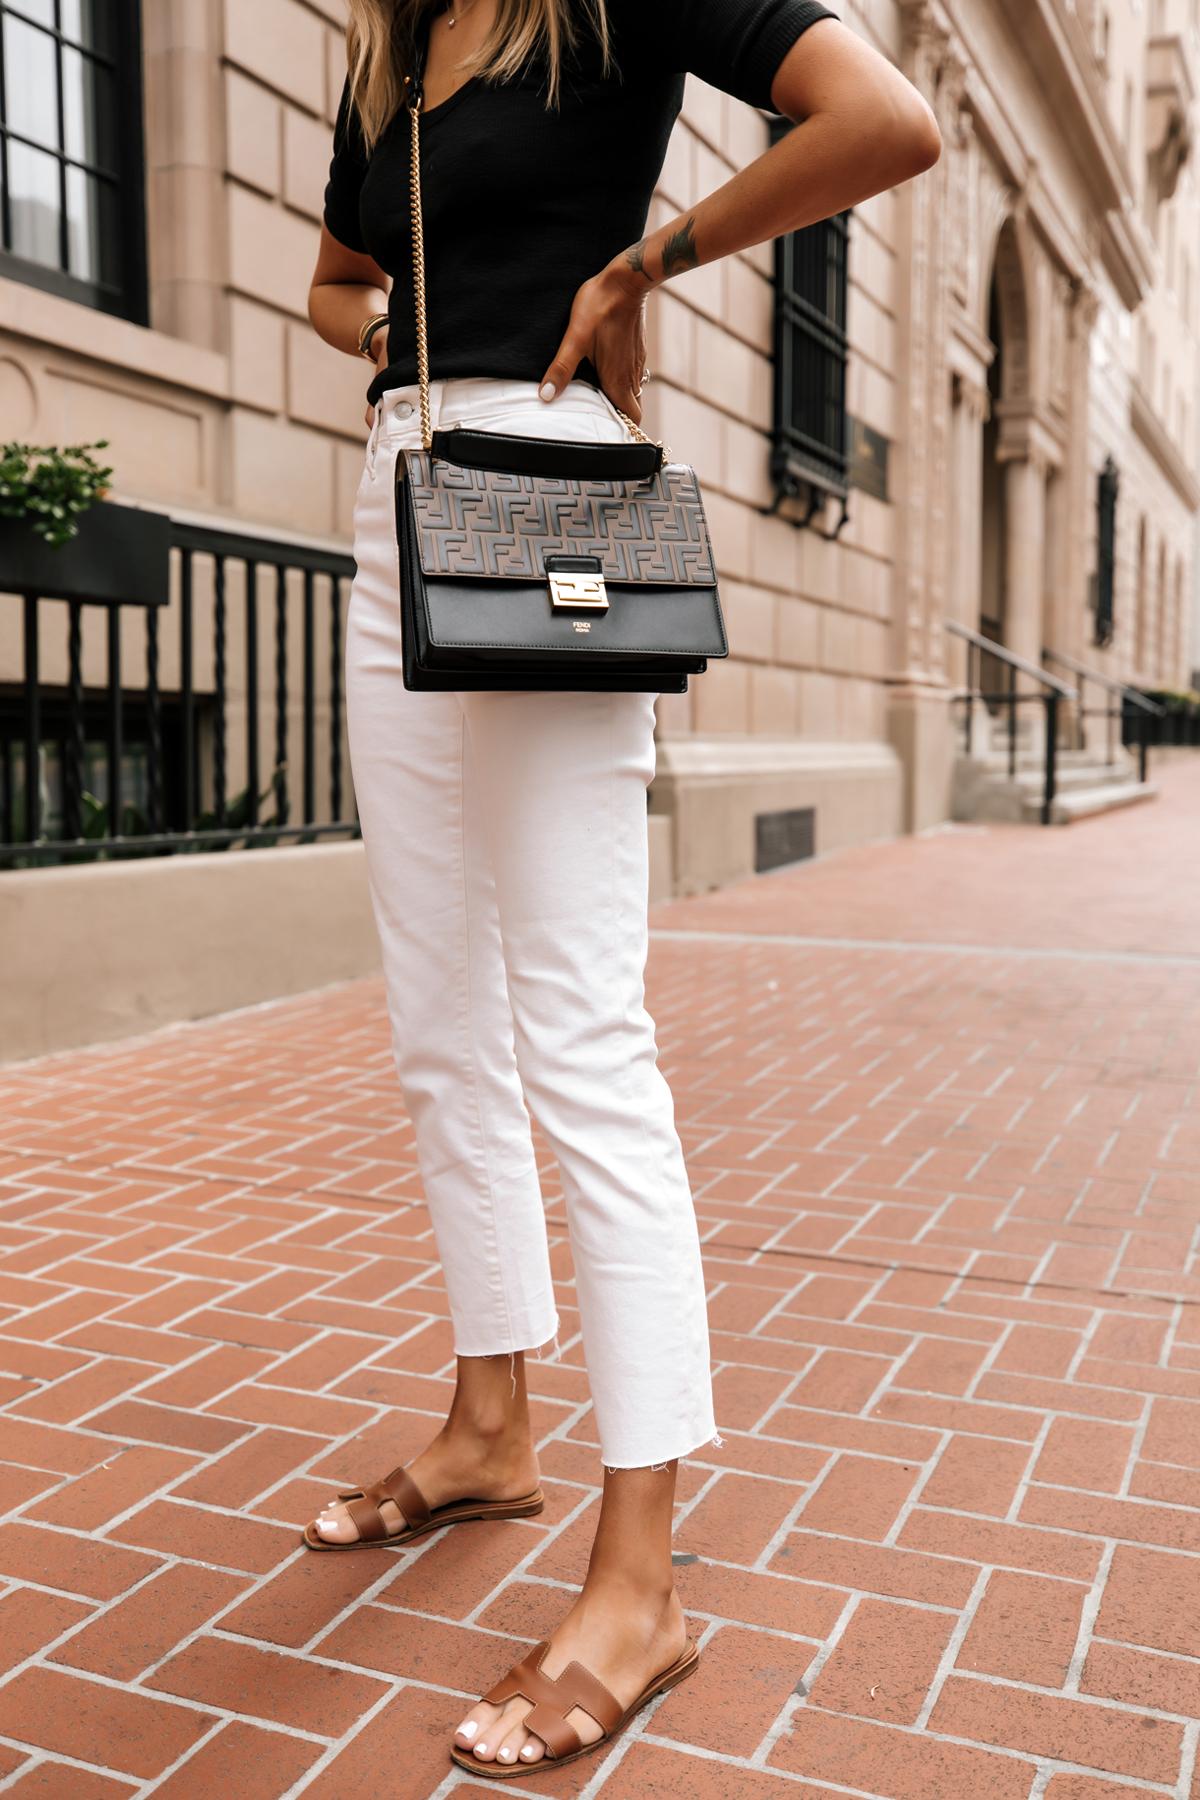 Fashion Jackson Wearing Black Scoop Neck Top White Jeans Fendi Ken U Medium Shoulder Bag Hermes Oran Tan Sandals White Jeans Outfit